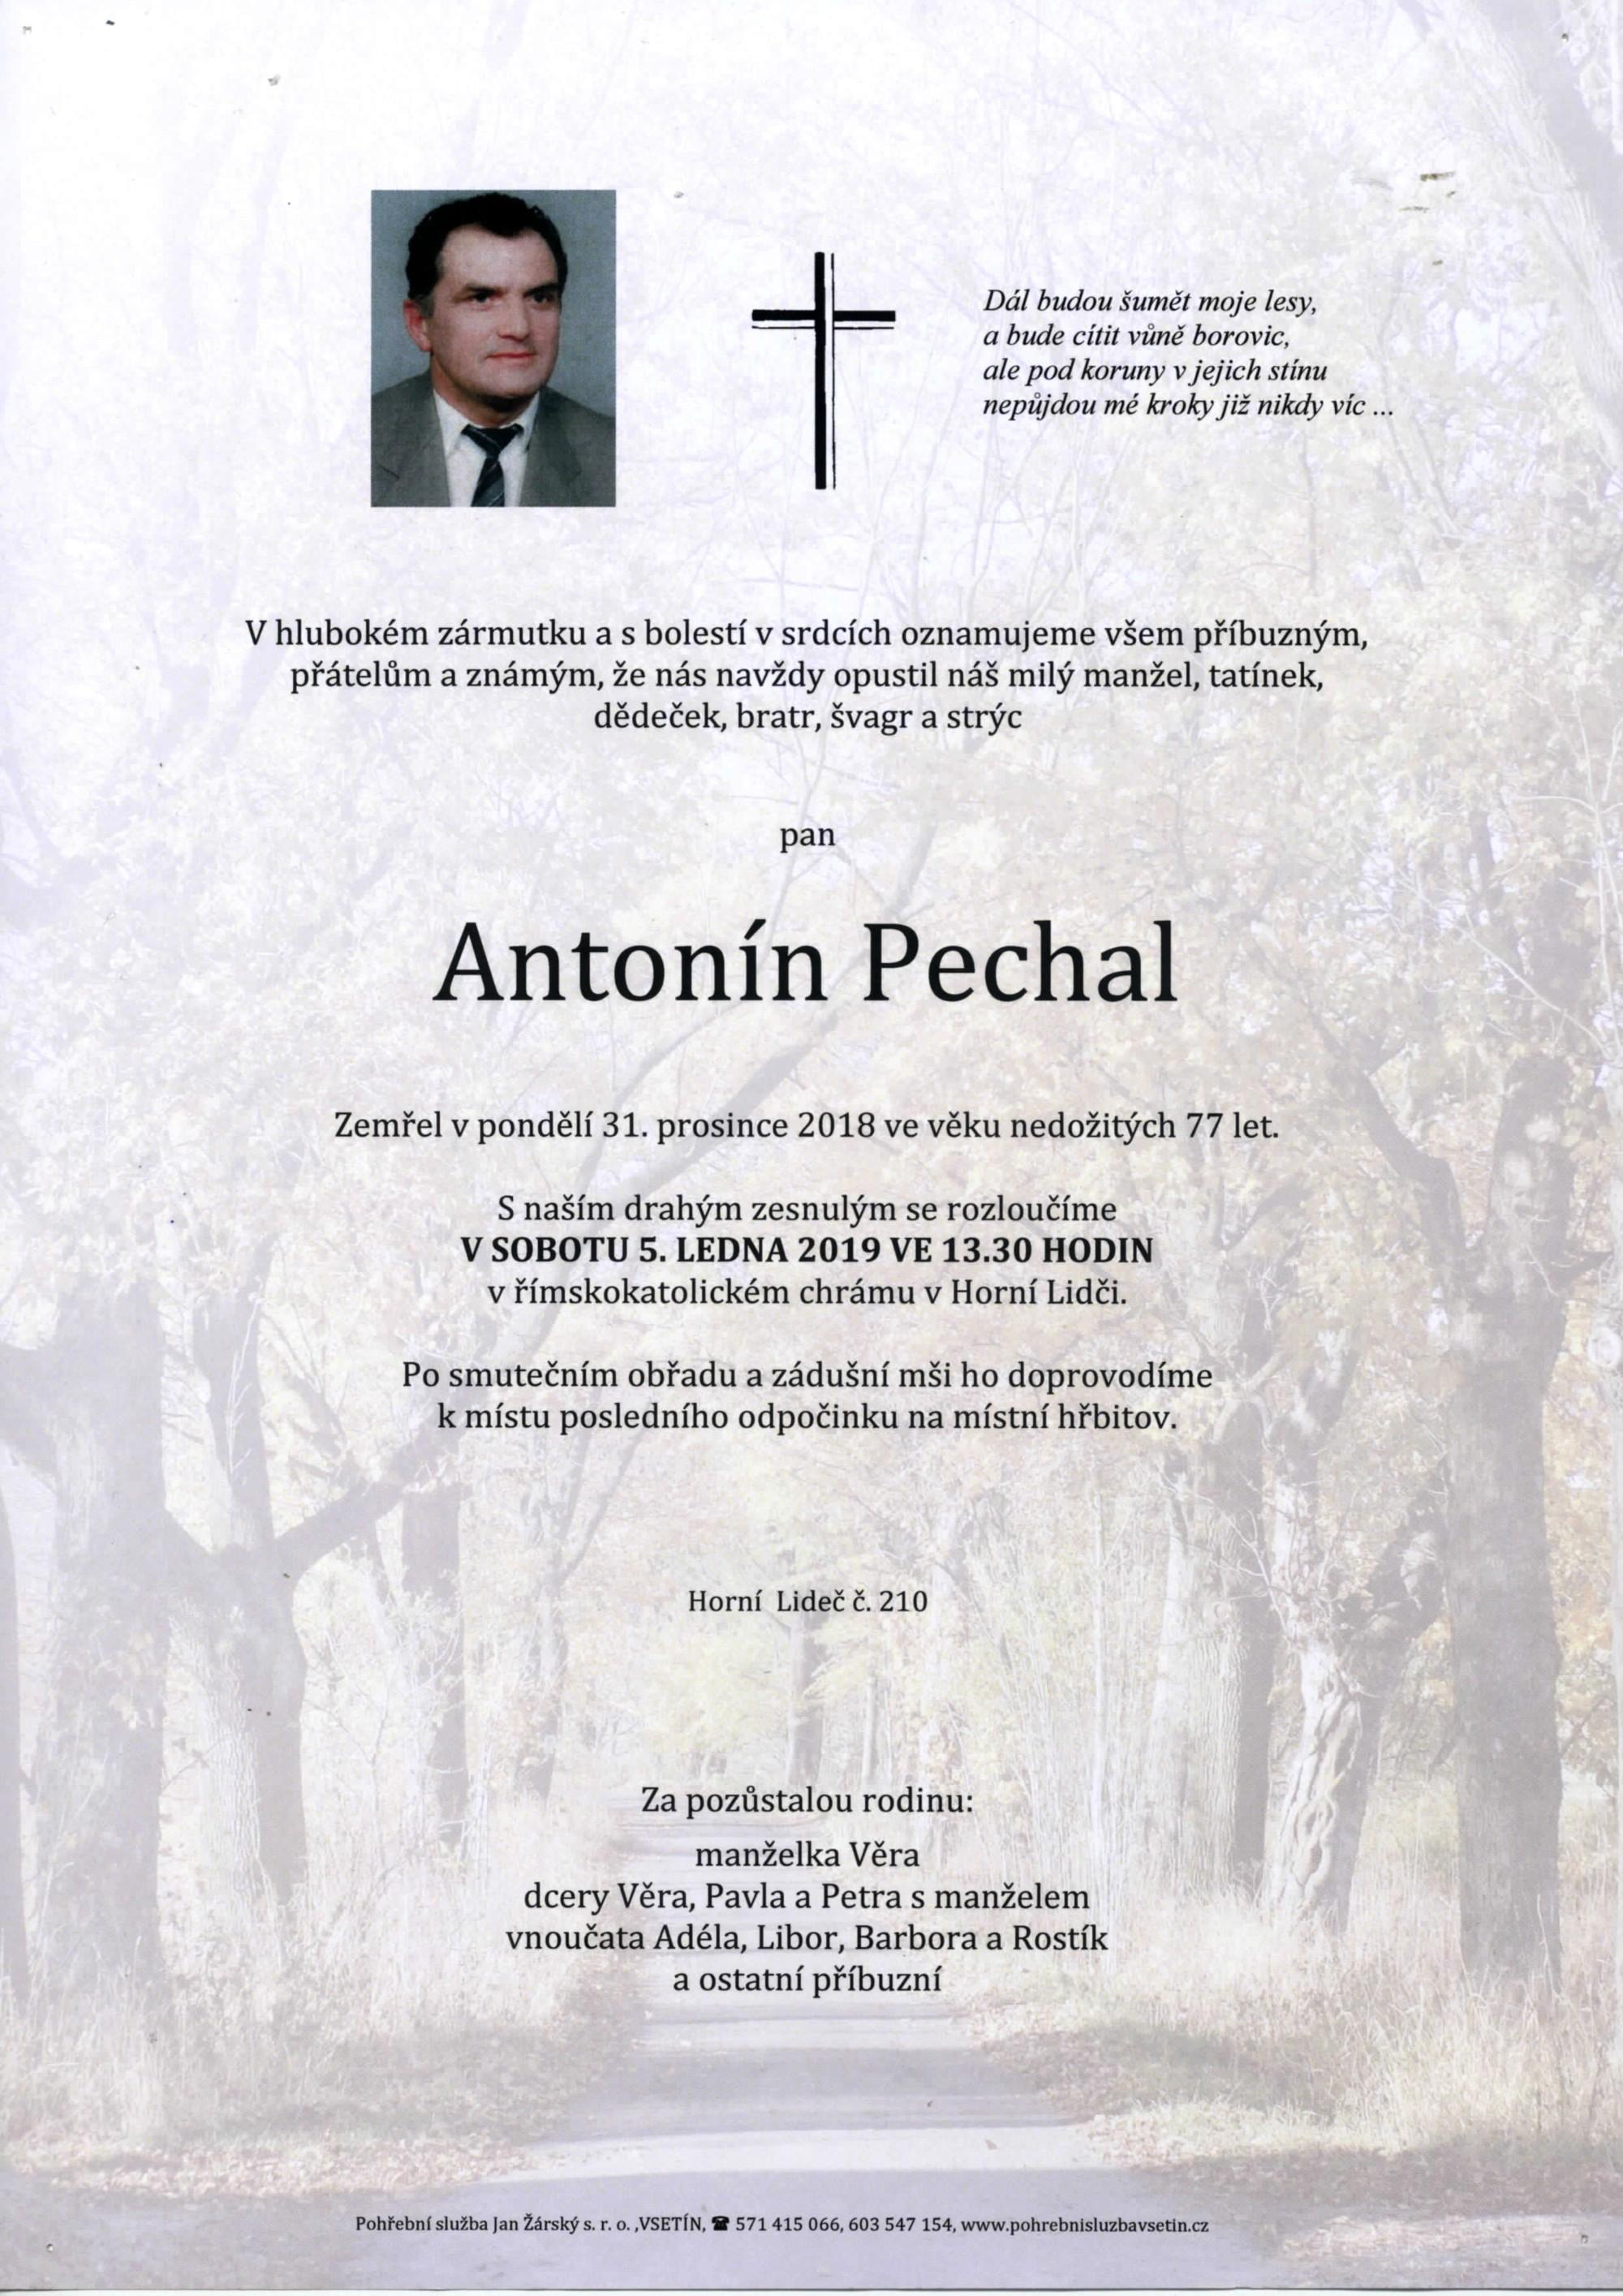 Antonín Pechal